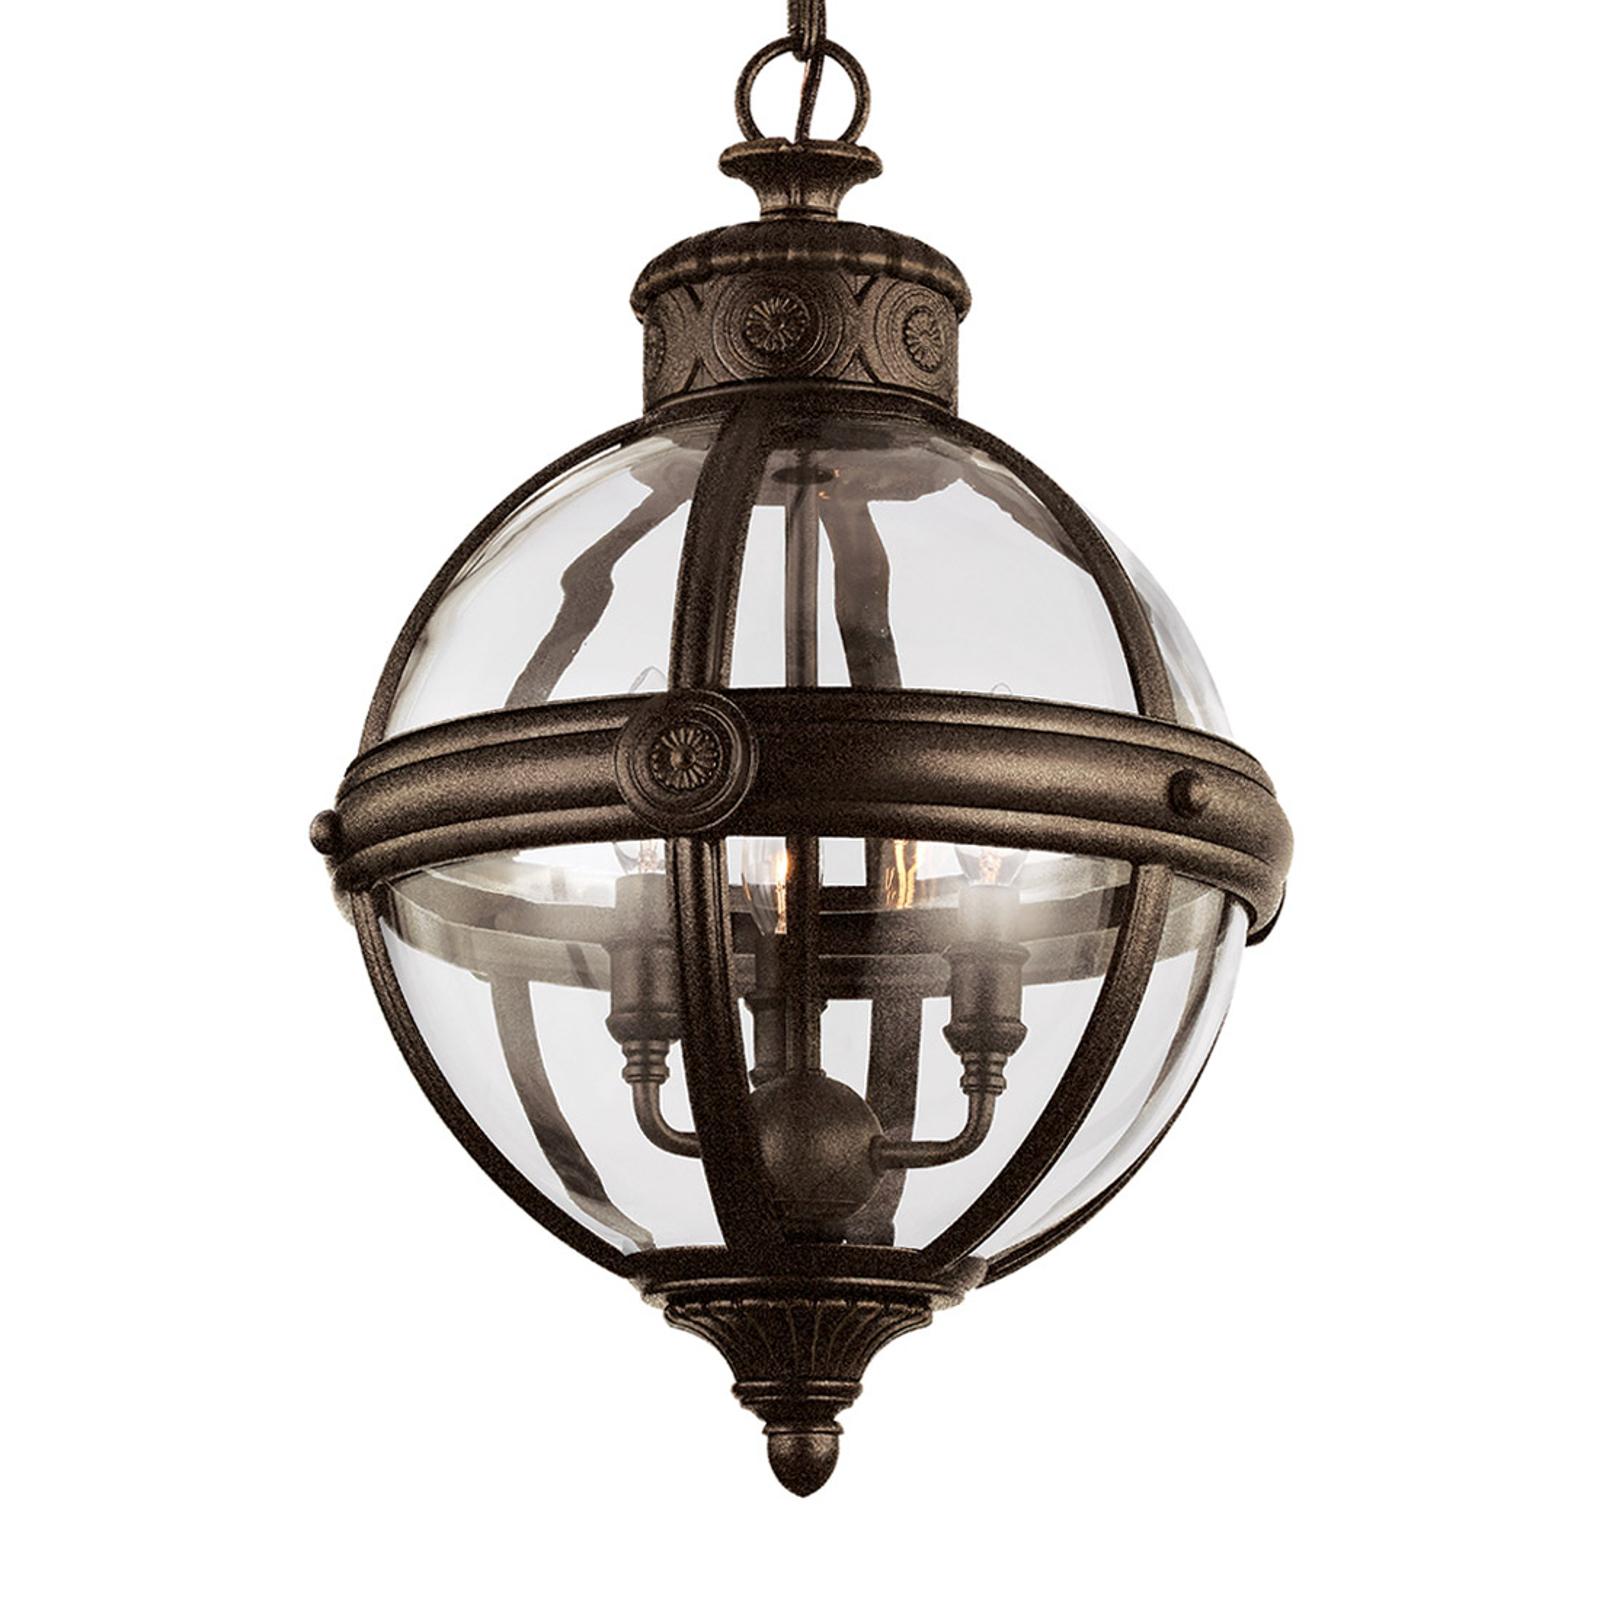 Závesná lampa Adams Ø 37cm bronz_3048316_1